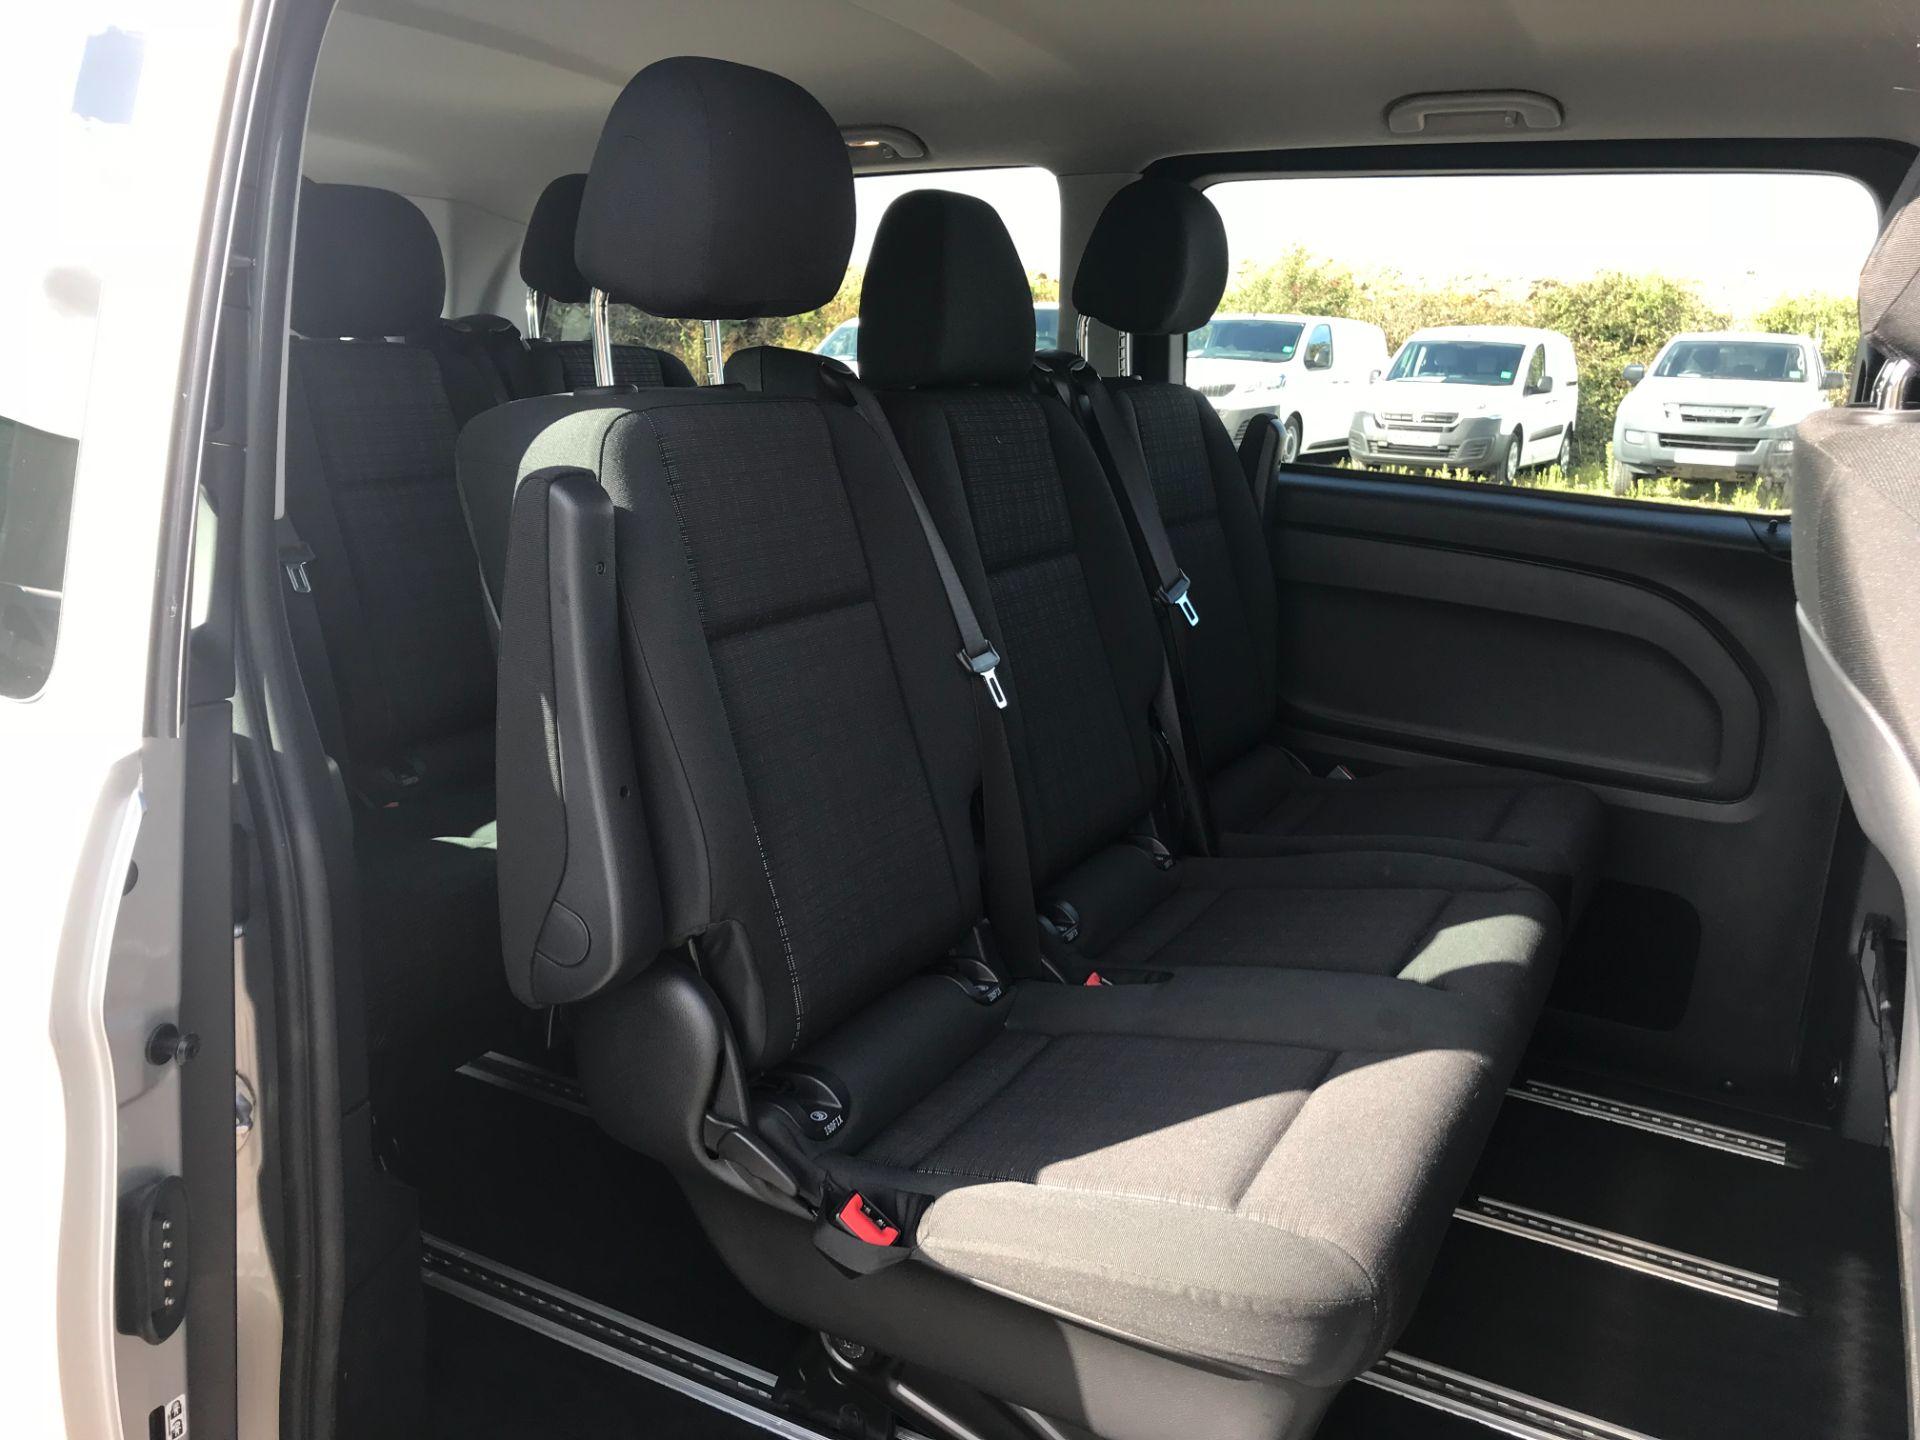 2019 Mercedes-Benz Vito 119 Cdi Select 8-Seater 7G-Tronic (KX19RZK) Image 11